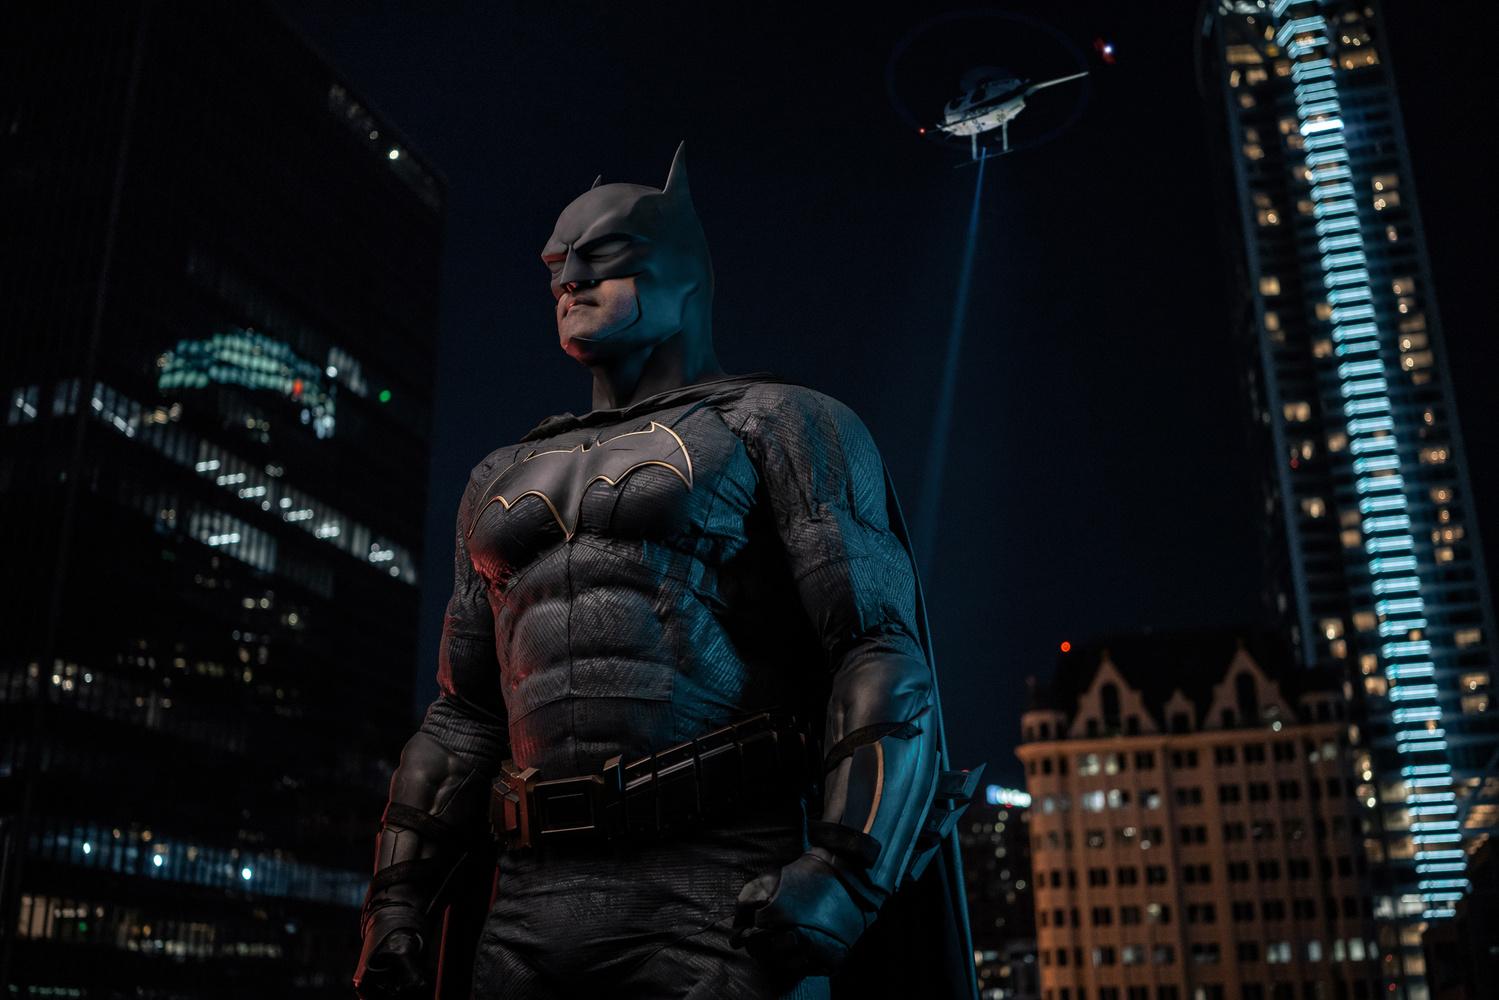 Batman by Ilya Nodia